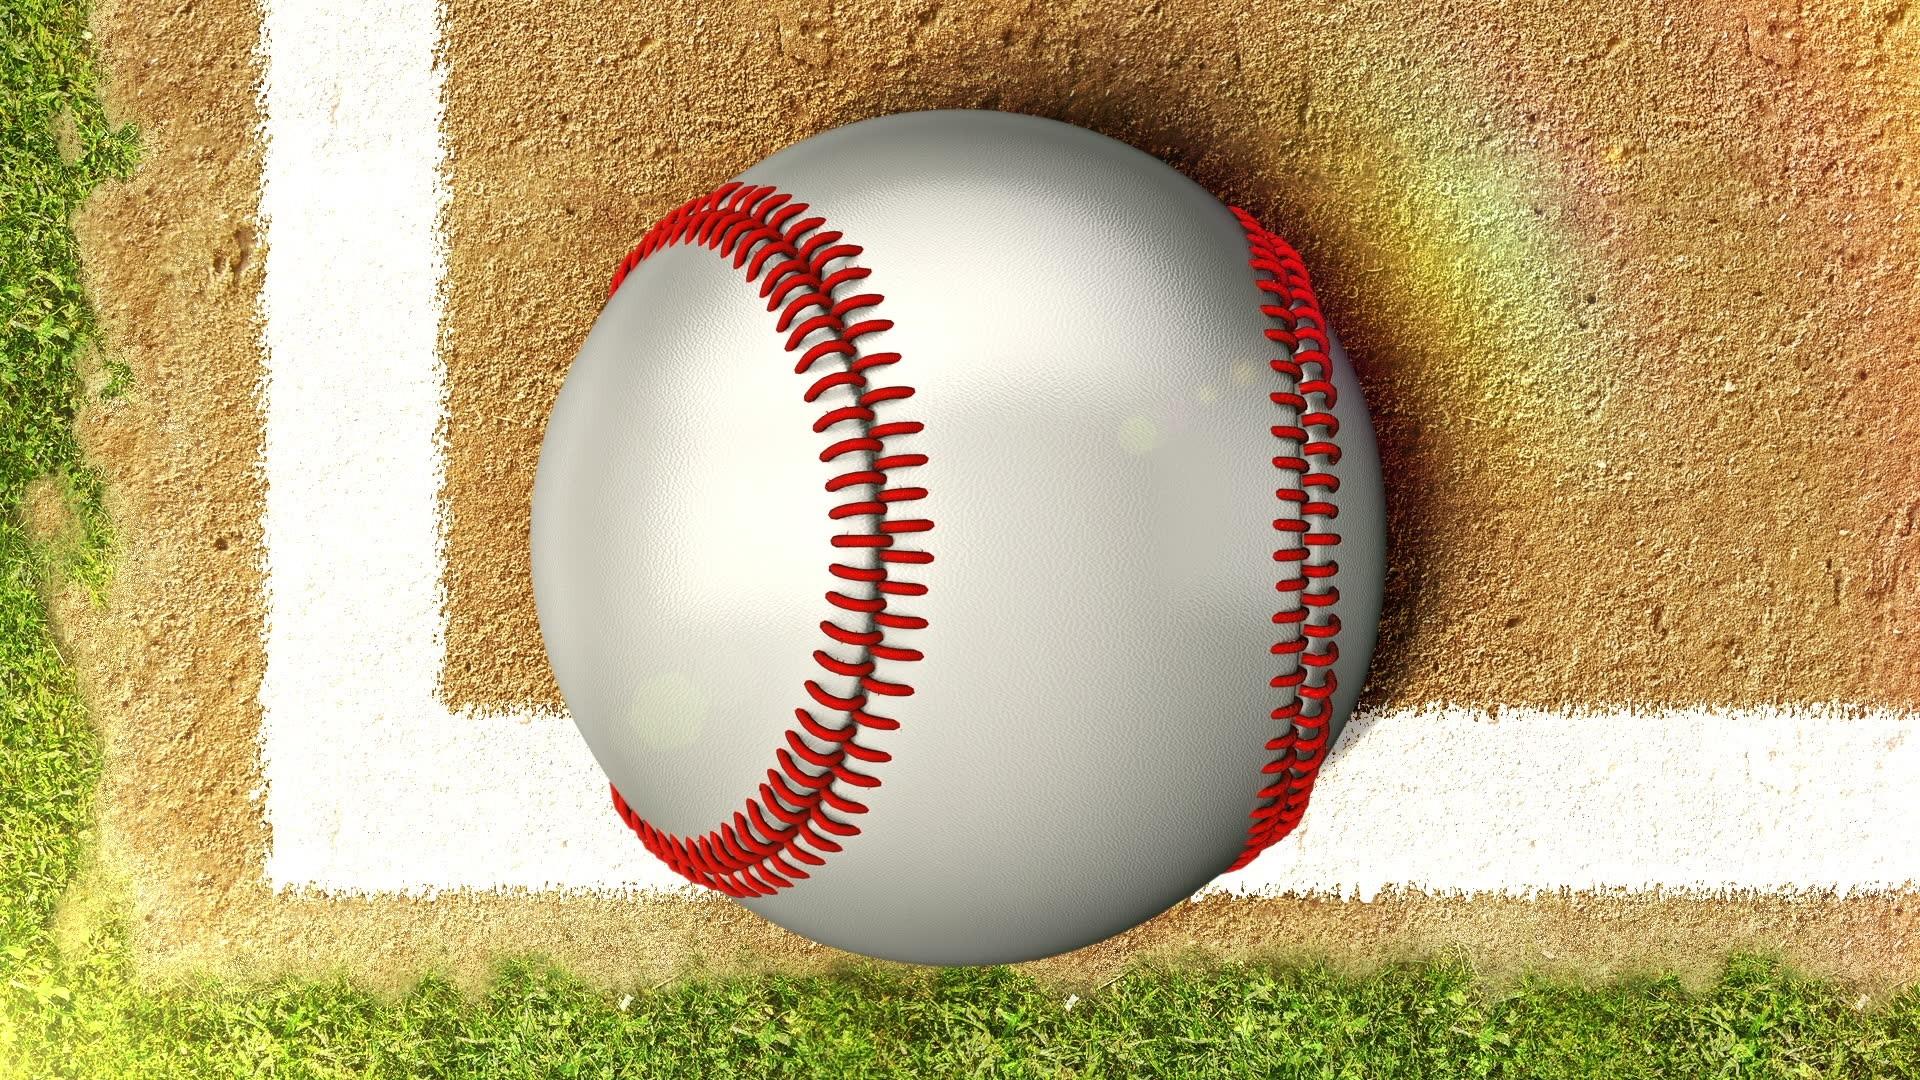 Softball PC Wallpaper HD